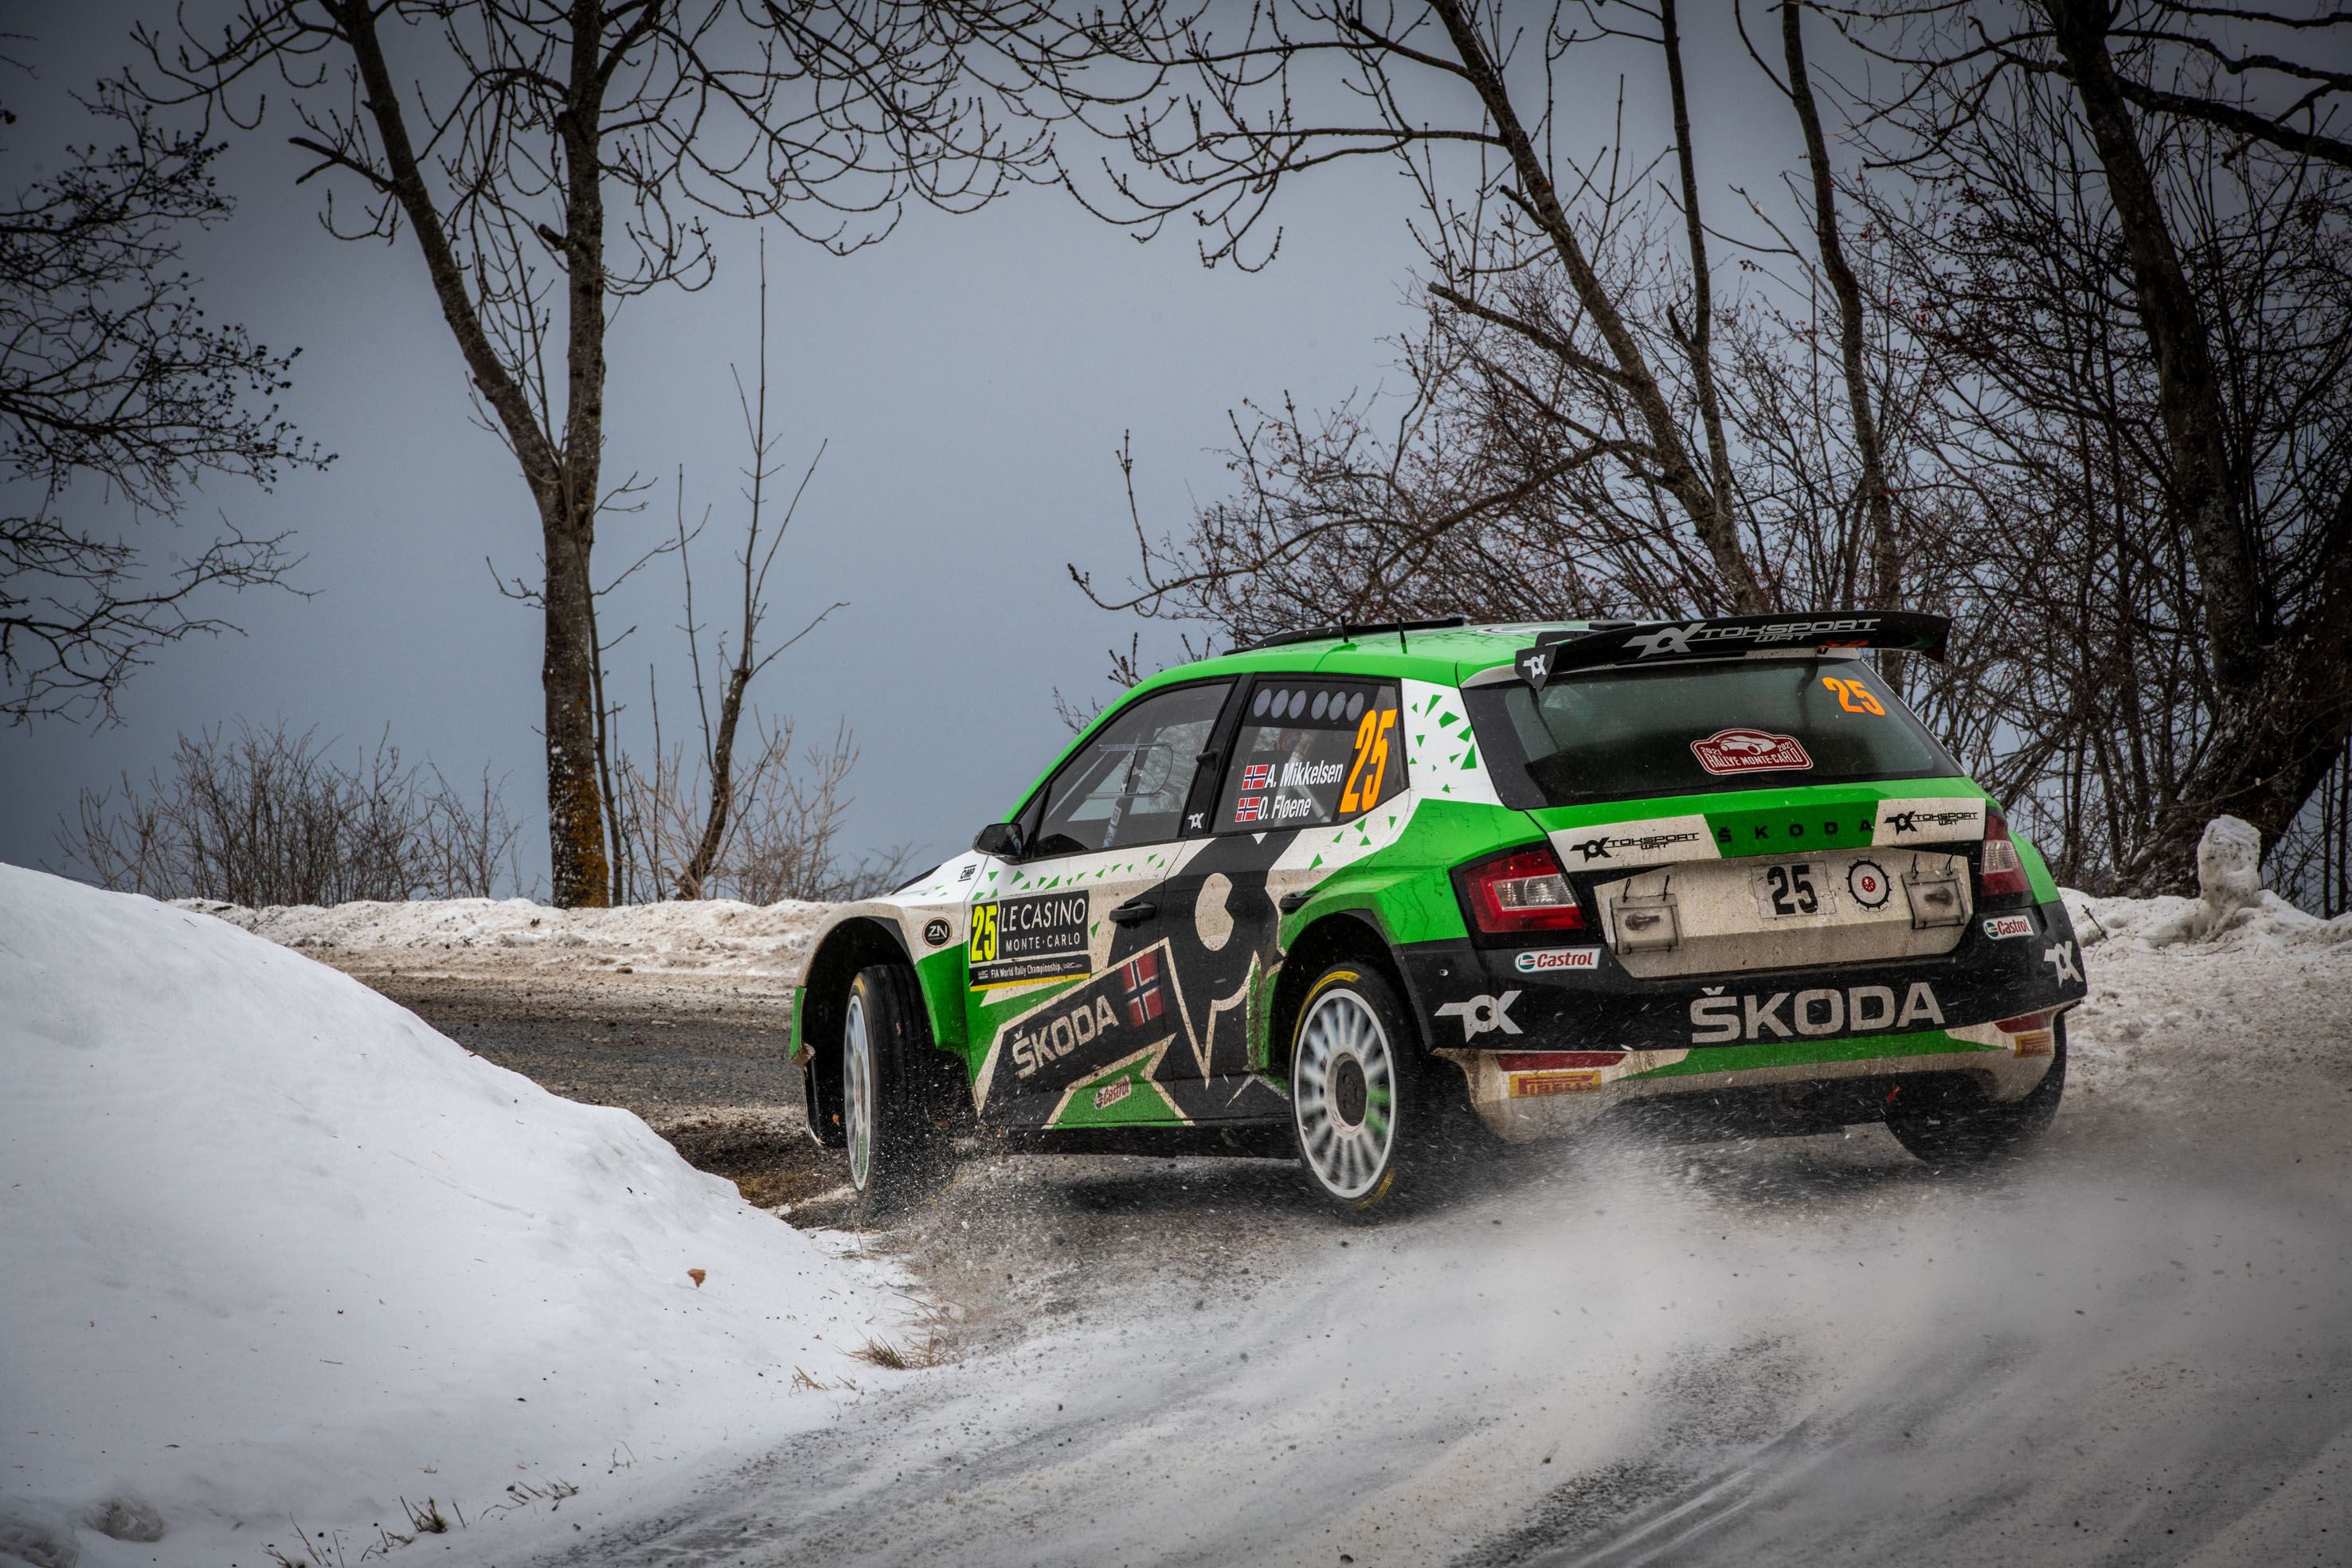 Rallye Monte-Carlo: SKODA FABIA Rally2 evo driver Mikkelsen starts as WRC2 leader into last leg - Image 3